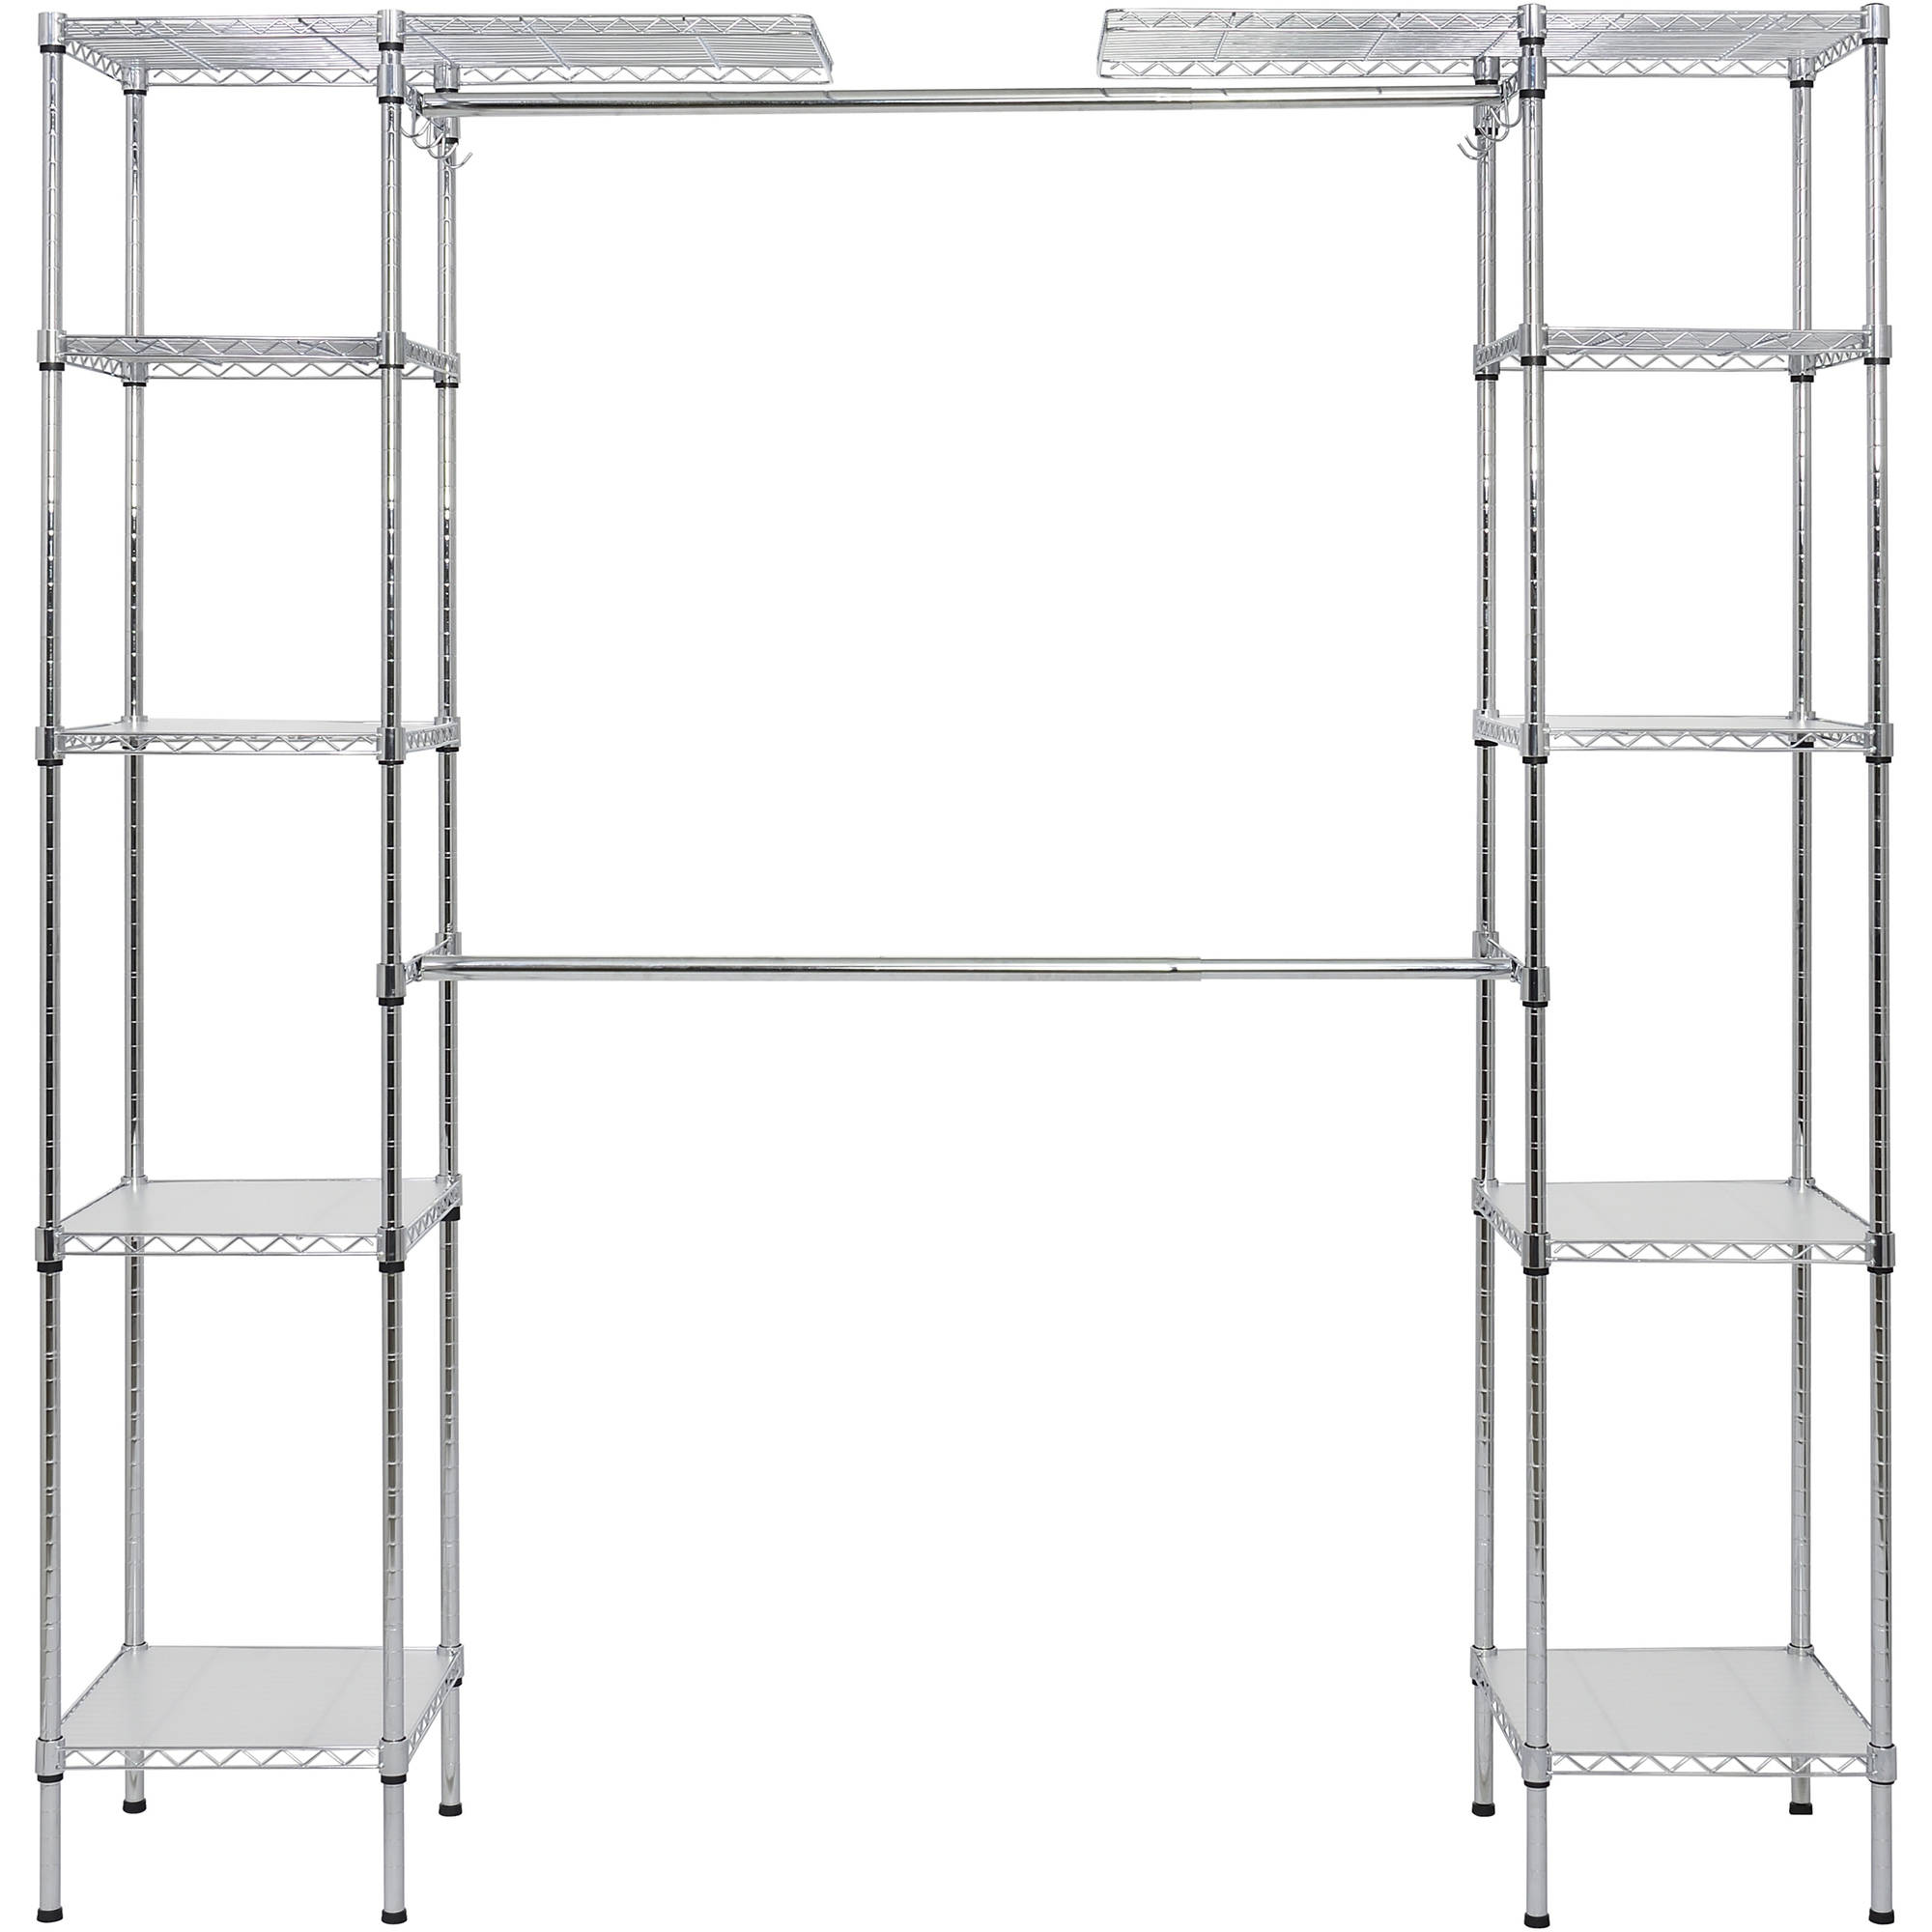 EDSAL ERZ722472S Bulk Storage Rack,Starter,72Wx24Dx72H In